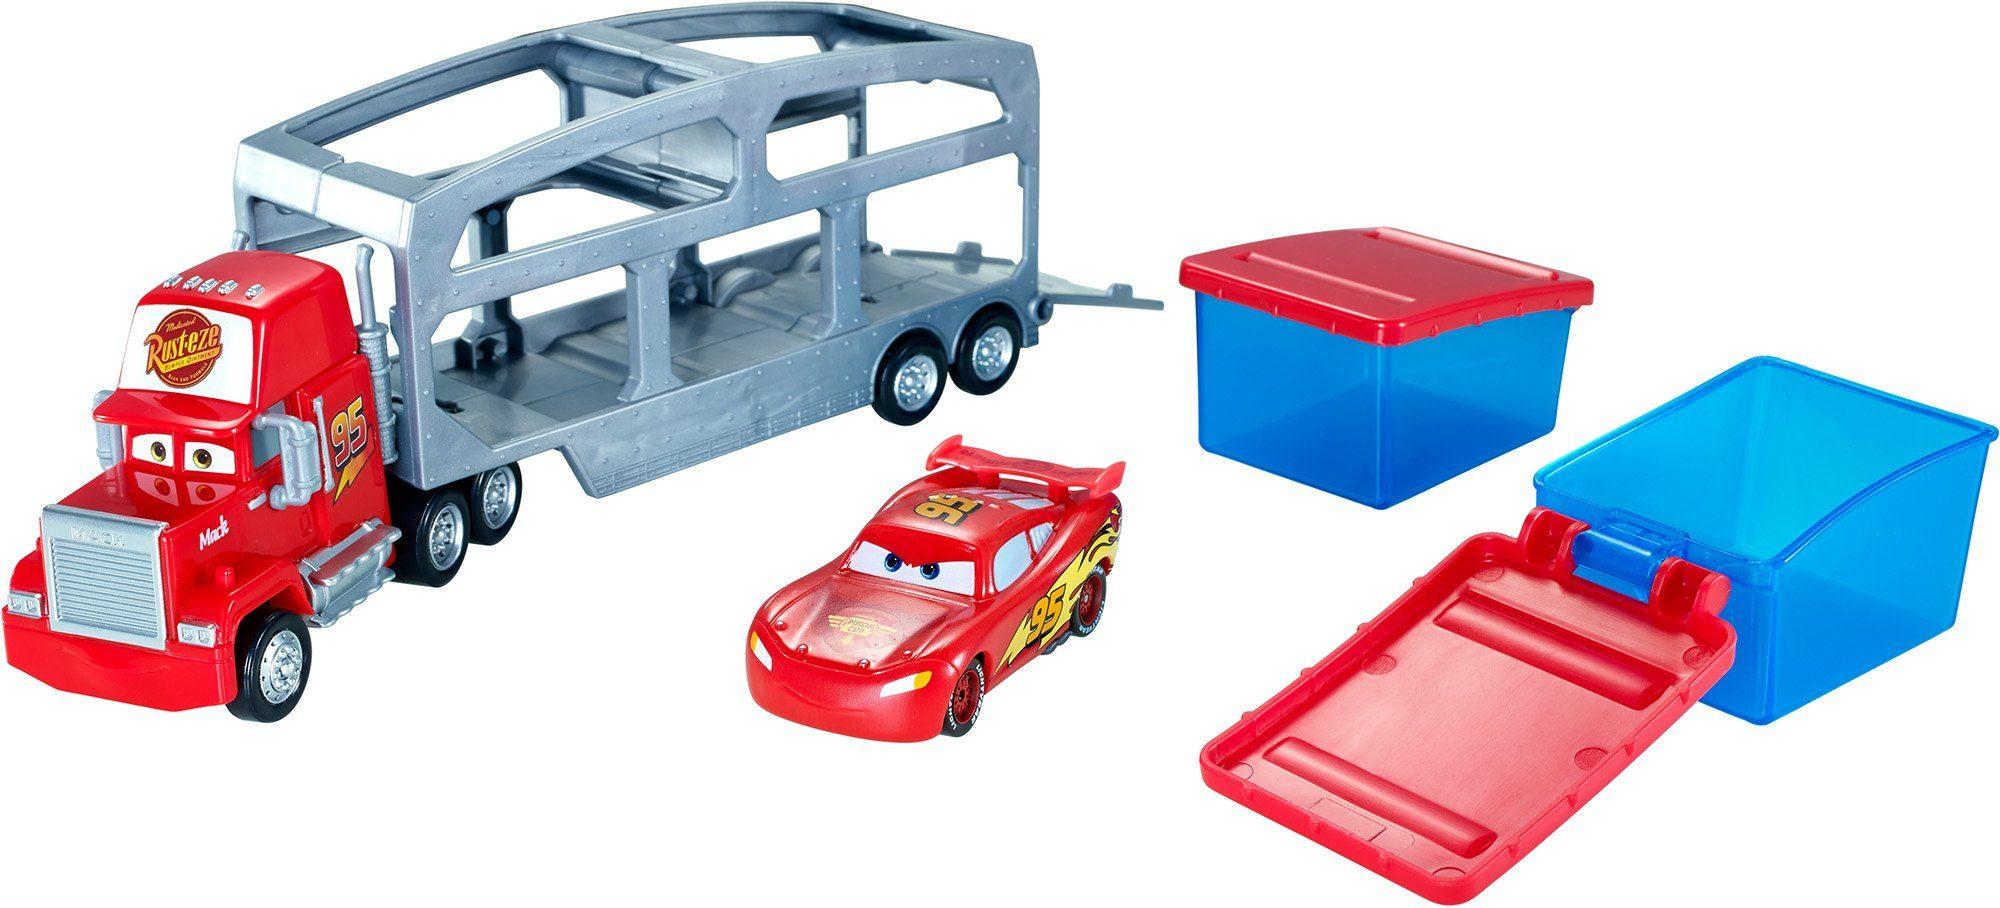 Mattel, Spielzeugautoset, »Disney Pixar Cars Macks Farbwechsel Station«